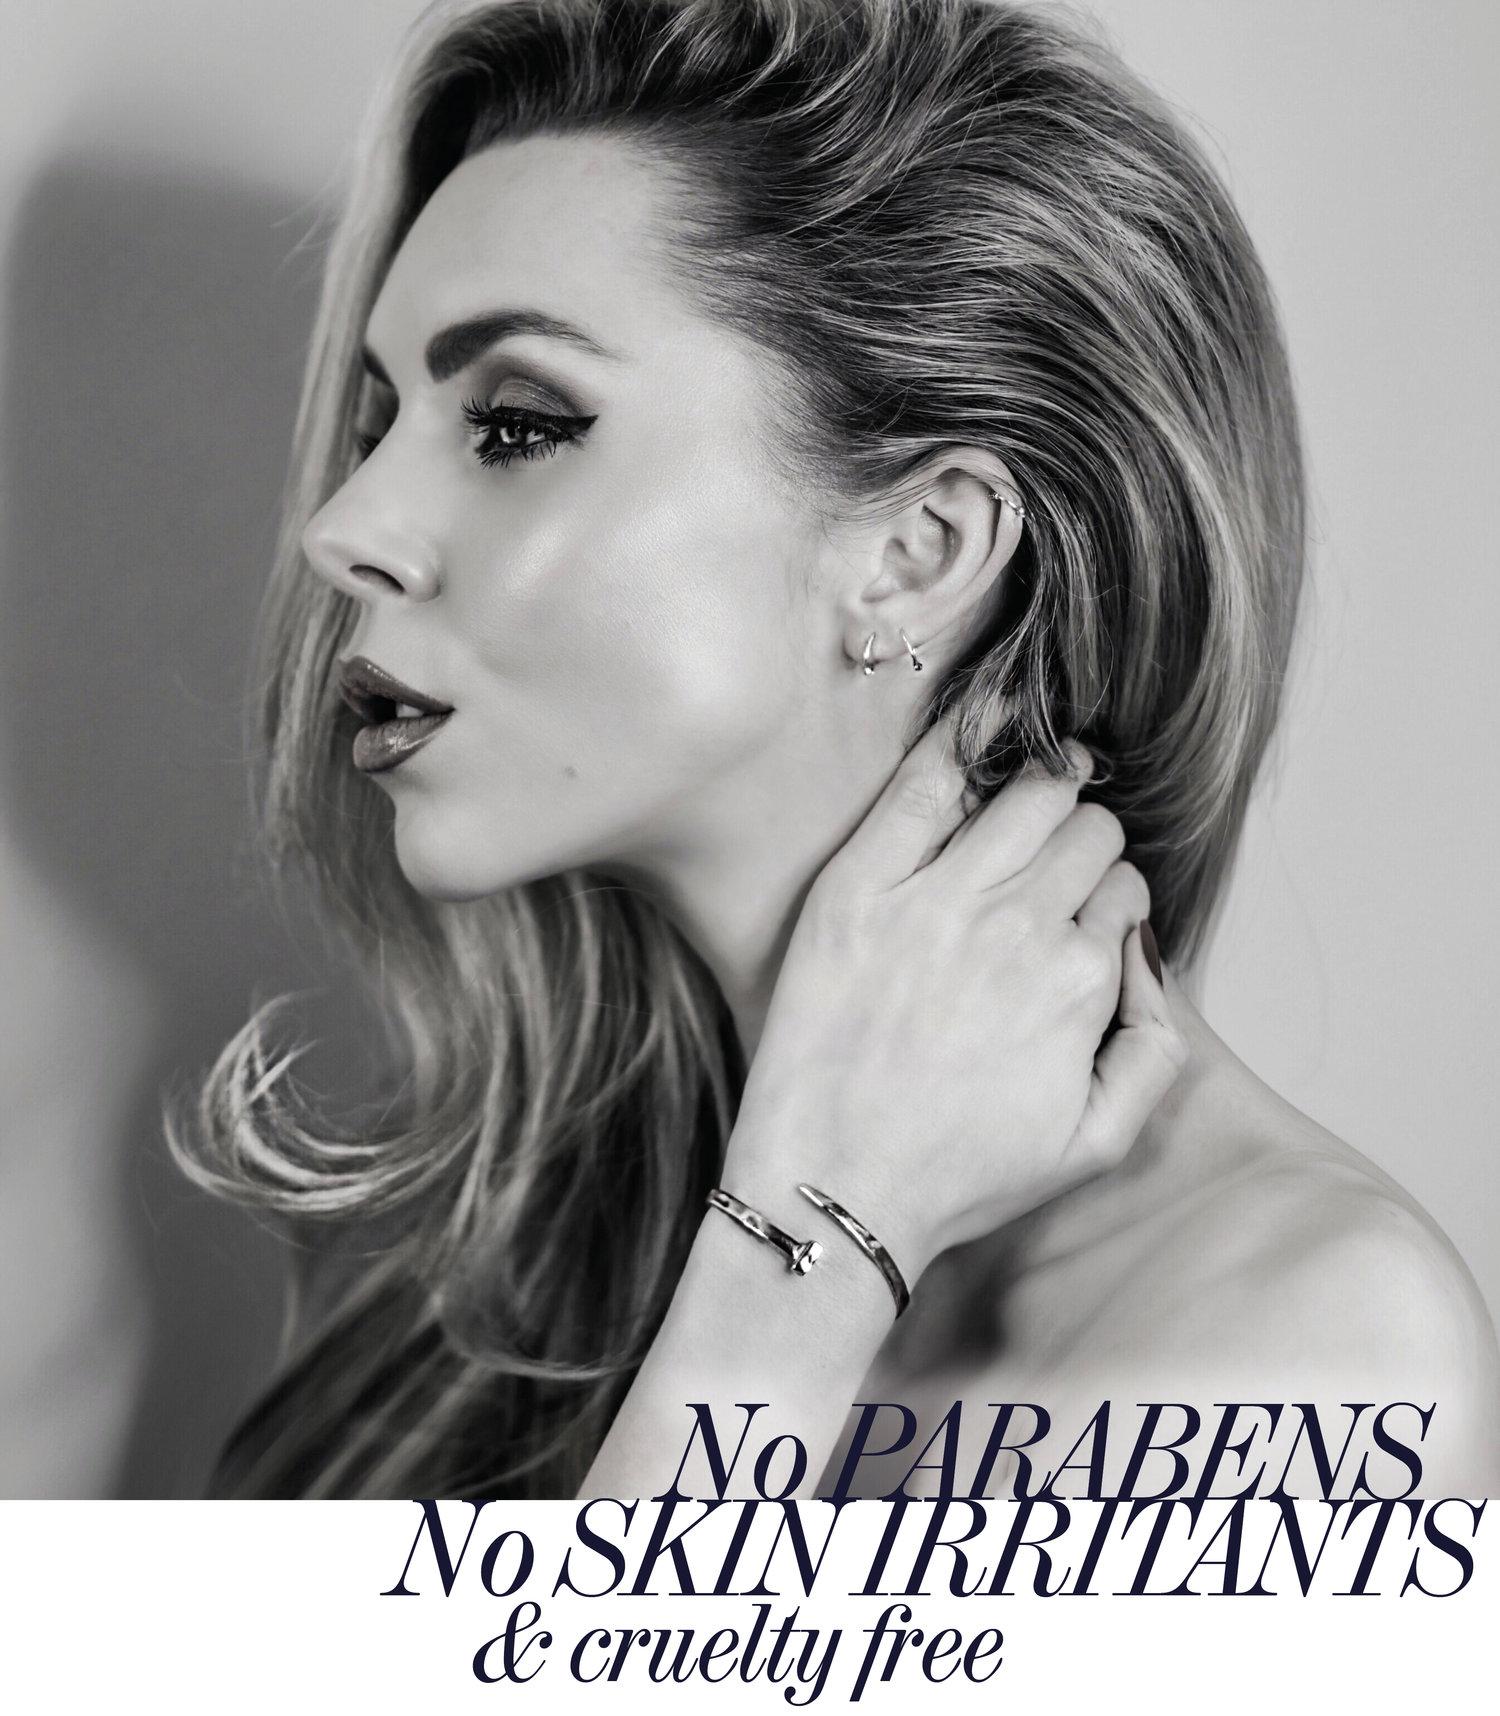 skinfix, beauty products for sensitive skin, beauty blogger uk, british blogger, Laura Blair, london fashion girl